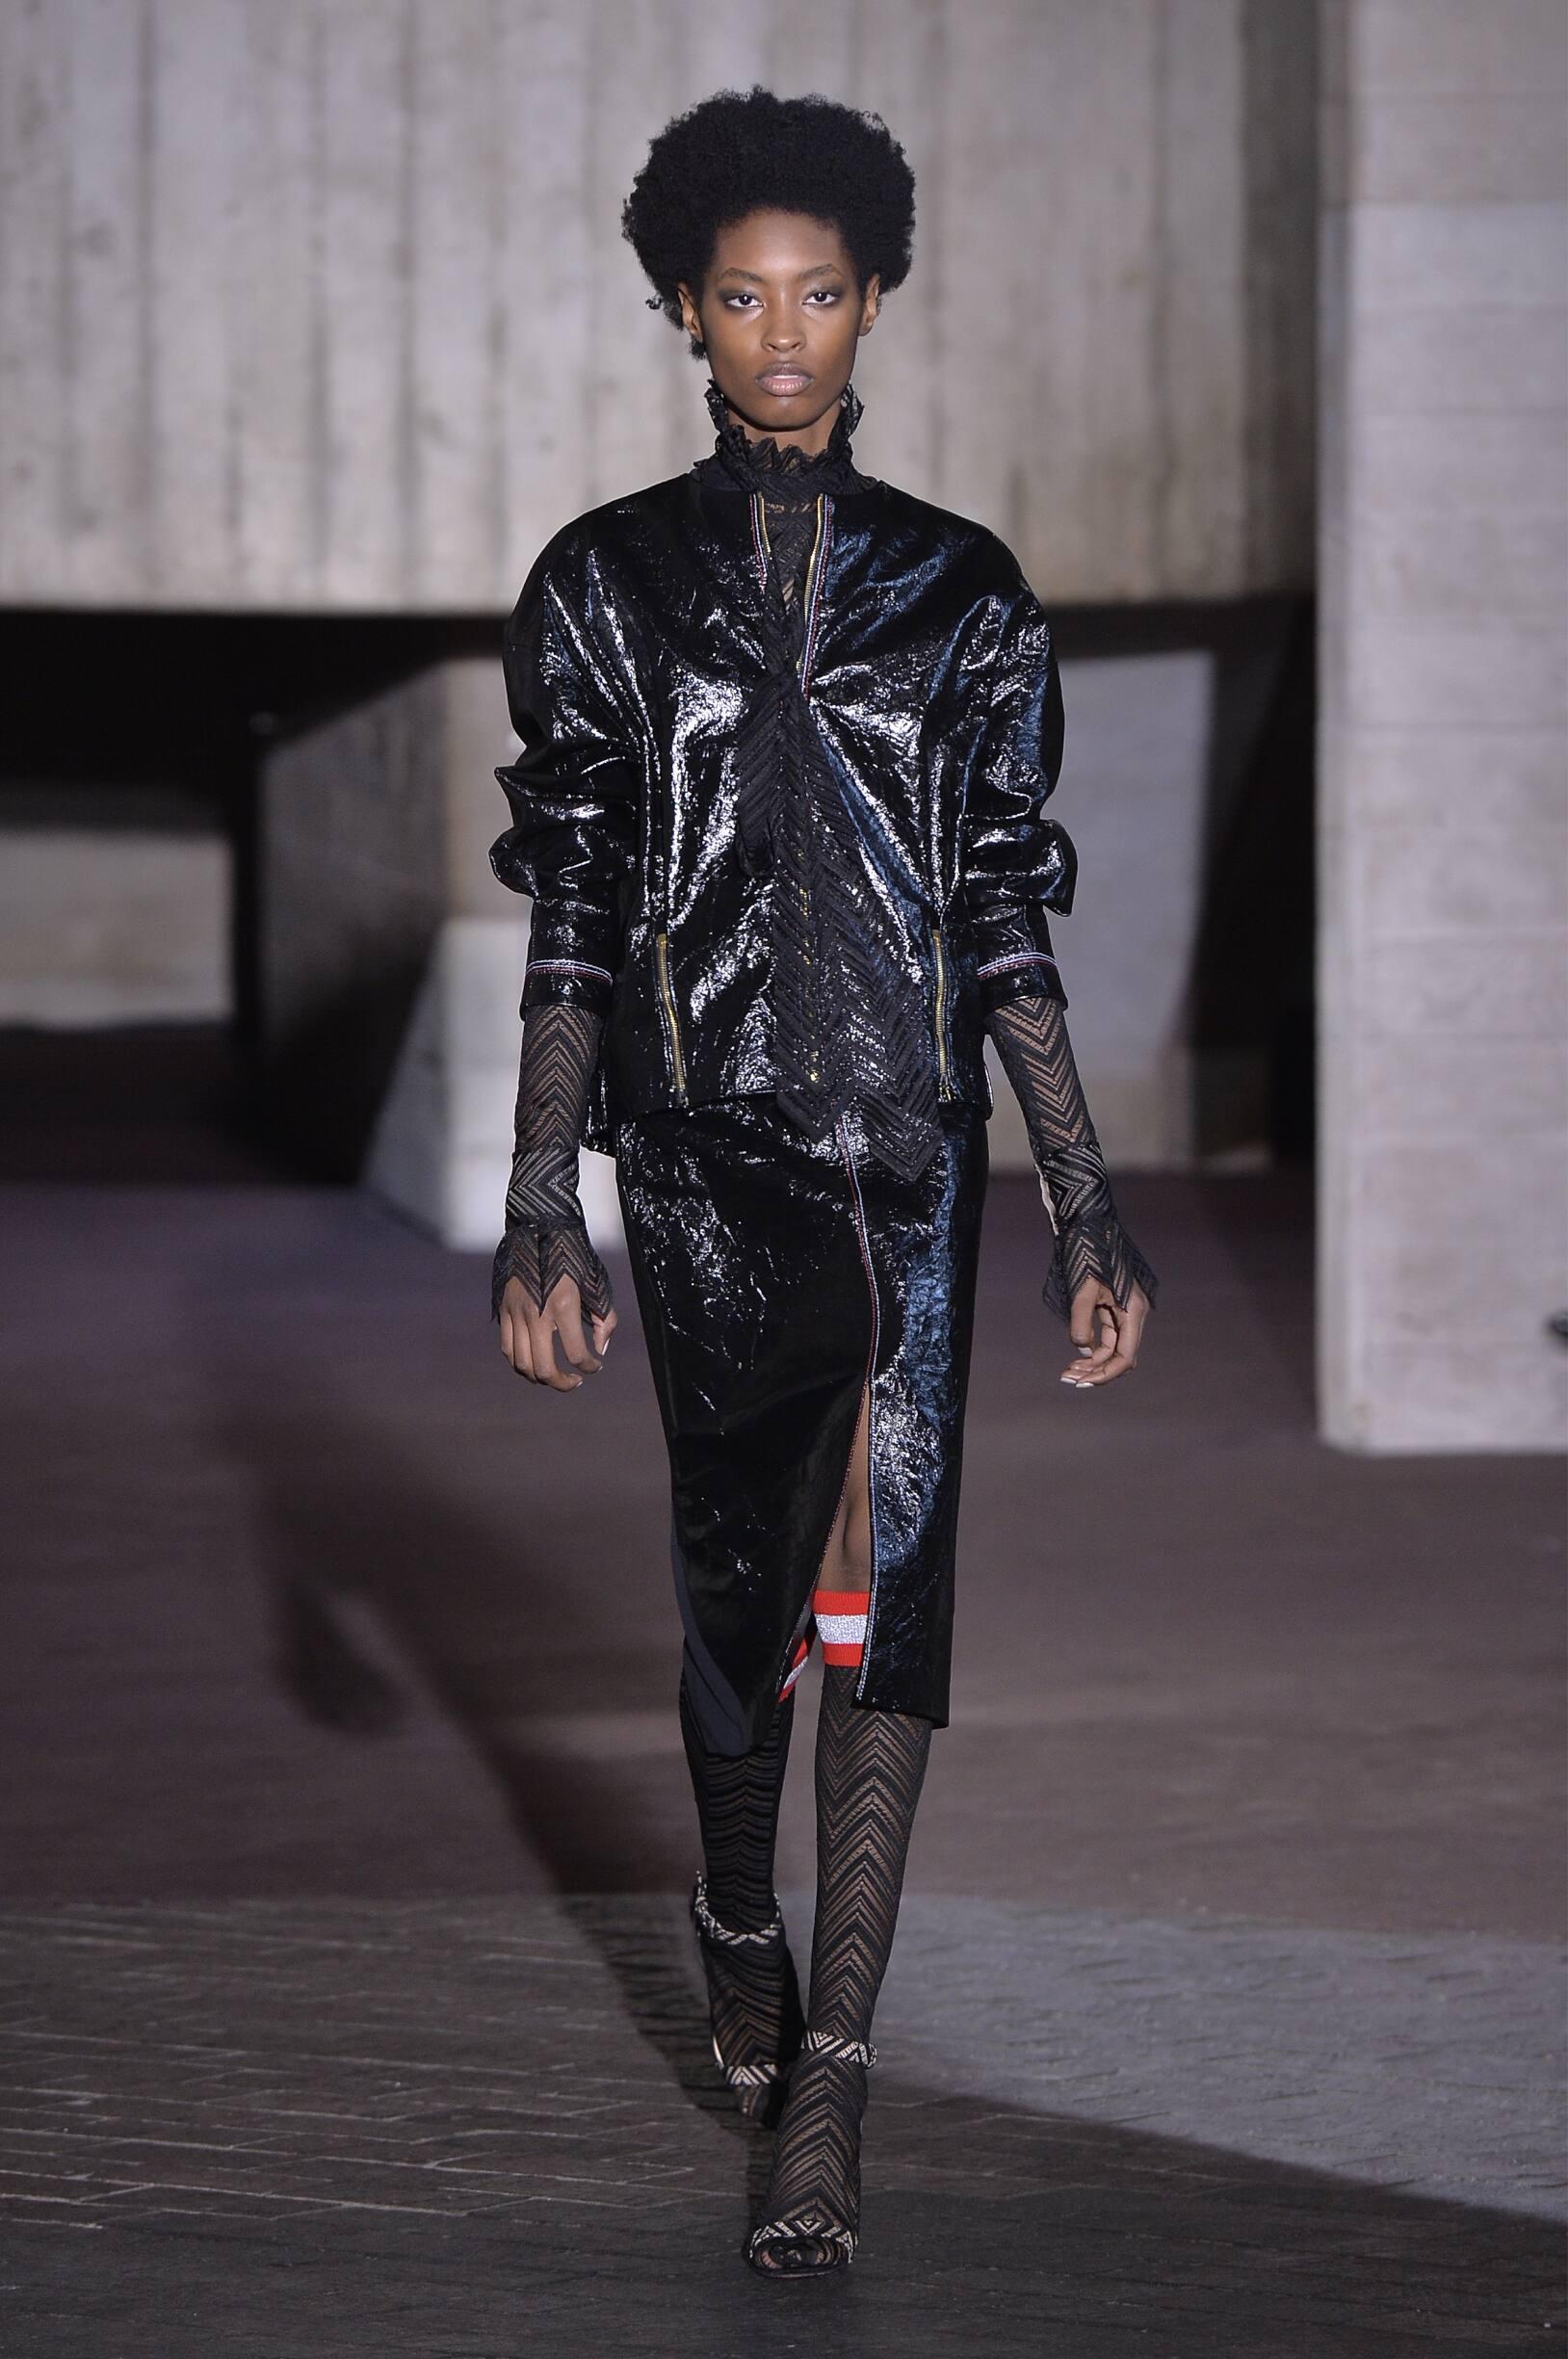 Runway Roland Mouret Fall Winter 2018 Women's Collection London Fashion Week